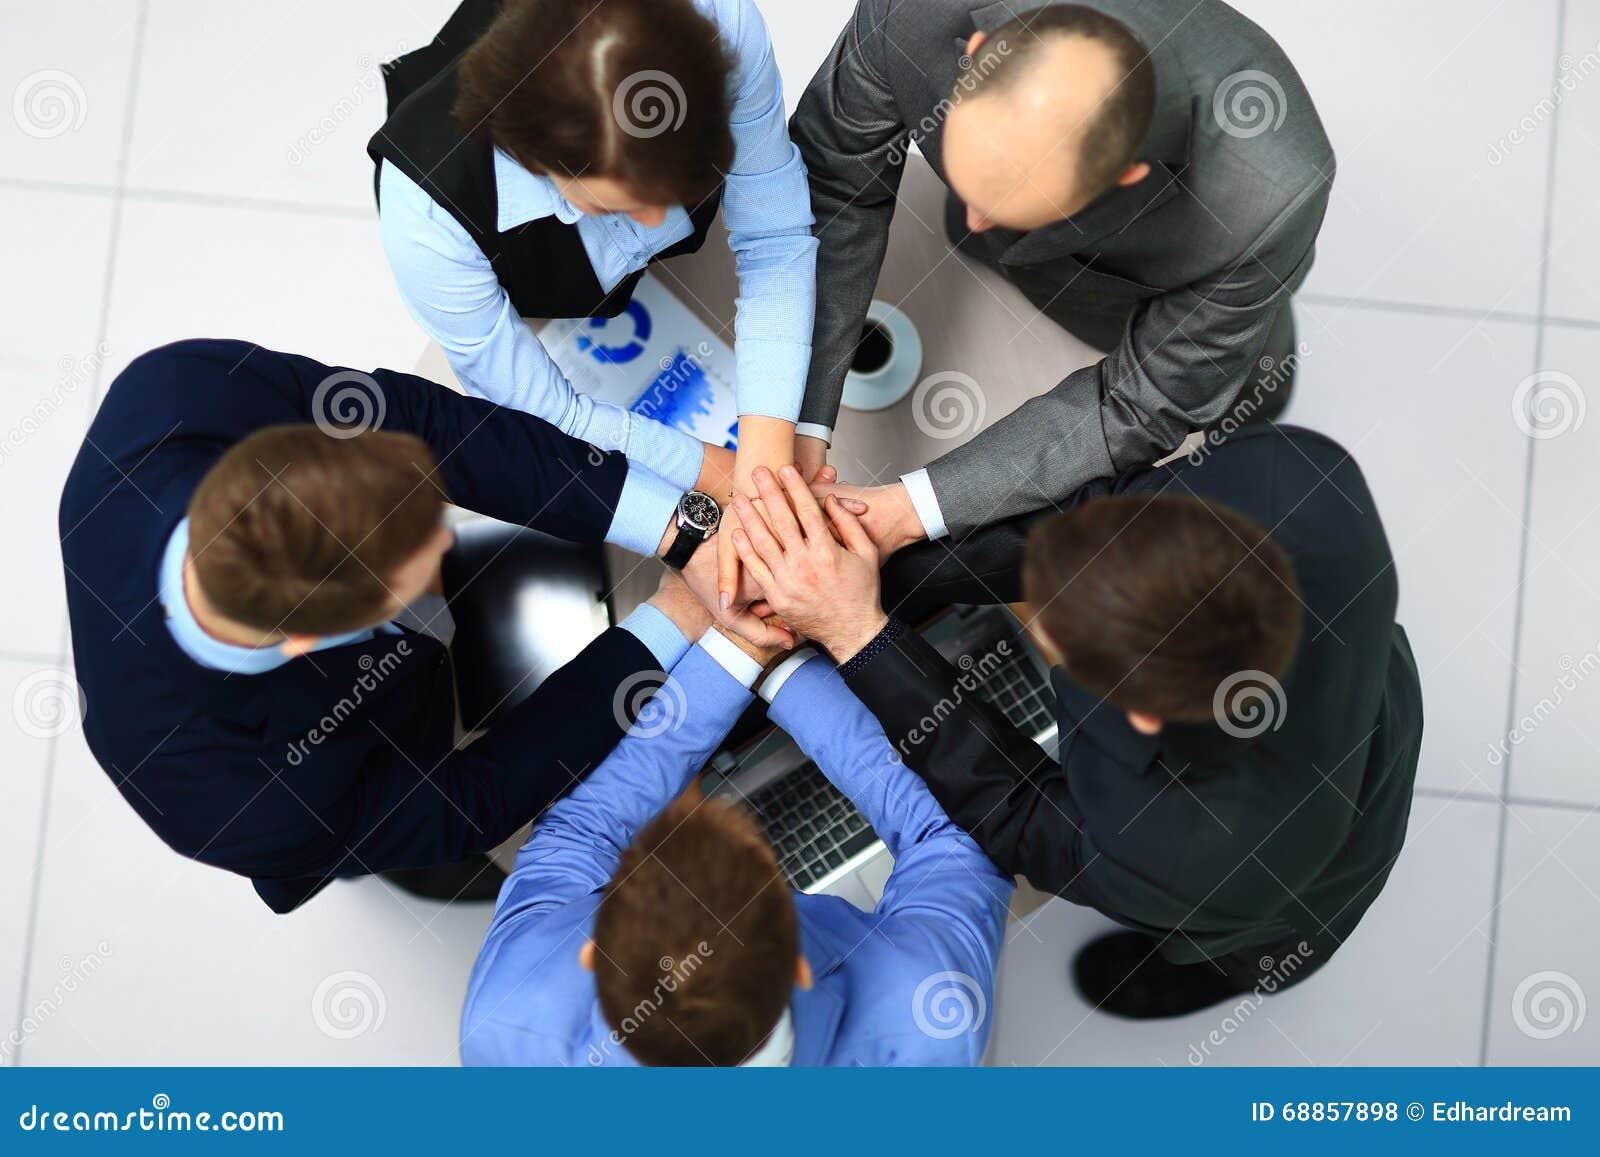 Team Teamwork Togetherness Community